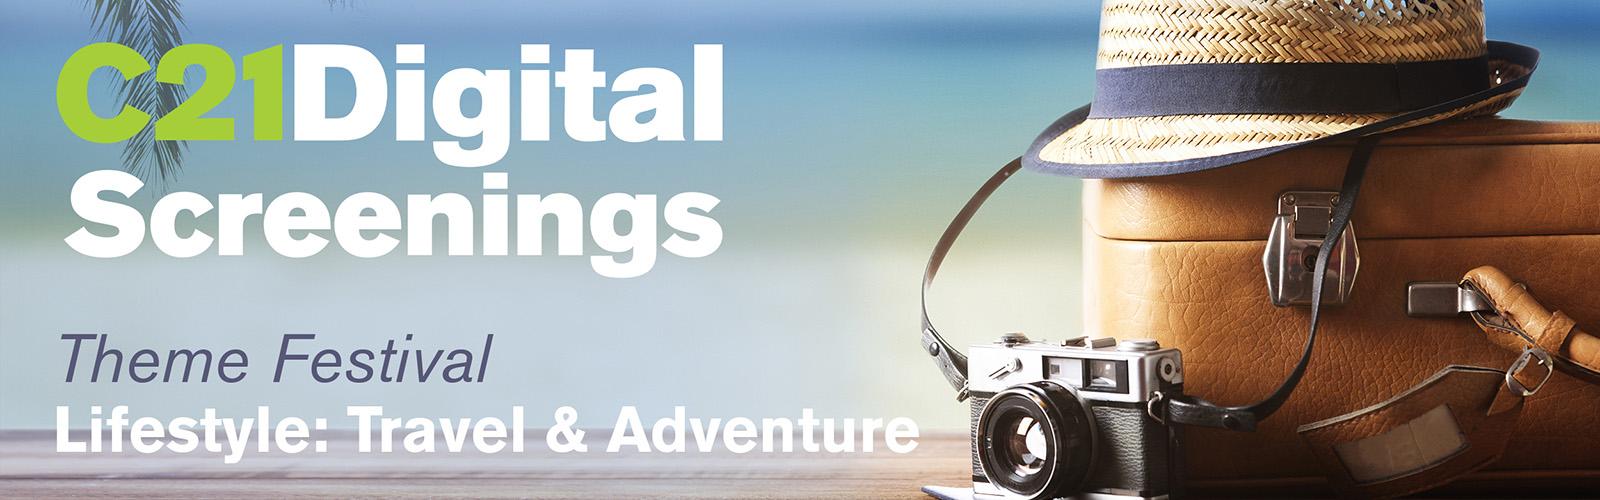 Theme Festival - Lifestyle: Travel & Adventure